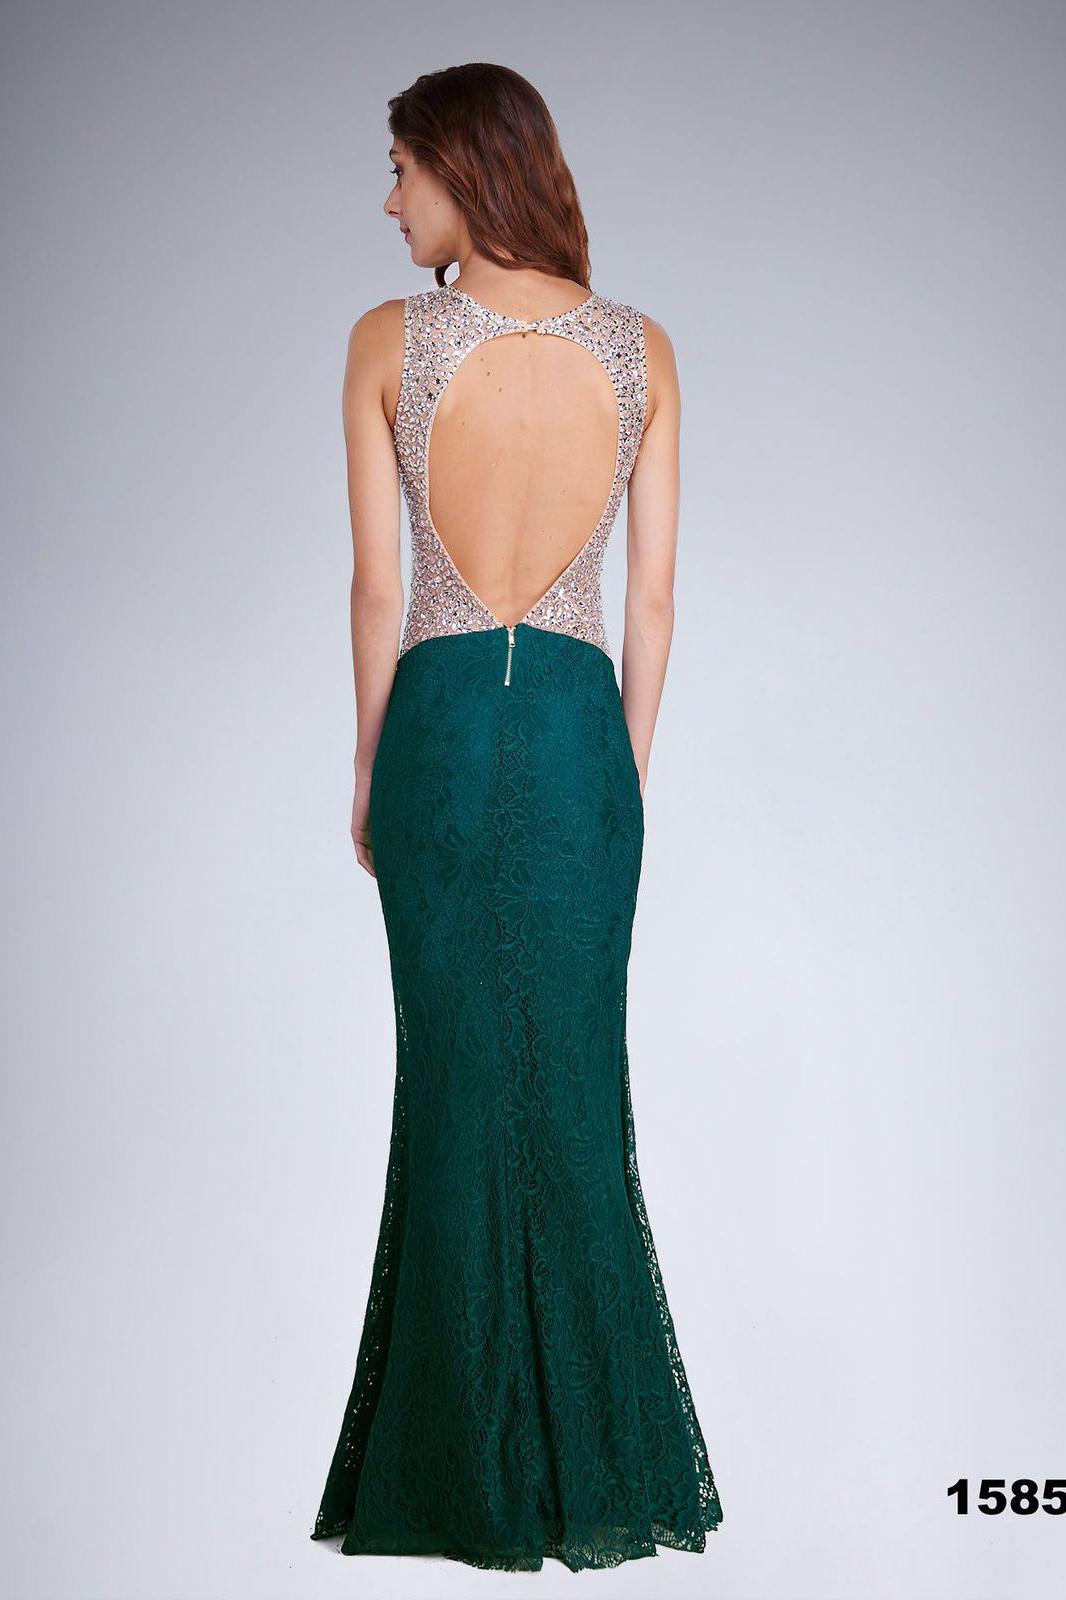 SOKY SOKA DRESS BOOTLE GREEN 4..